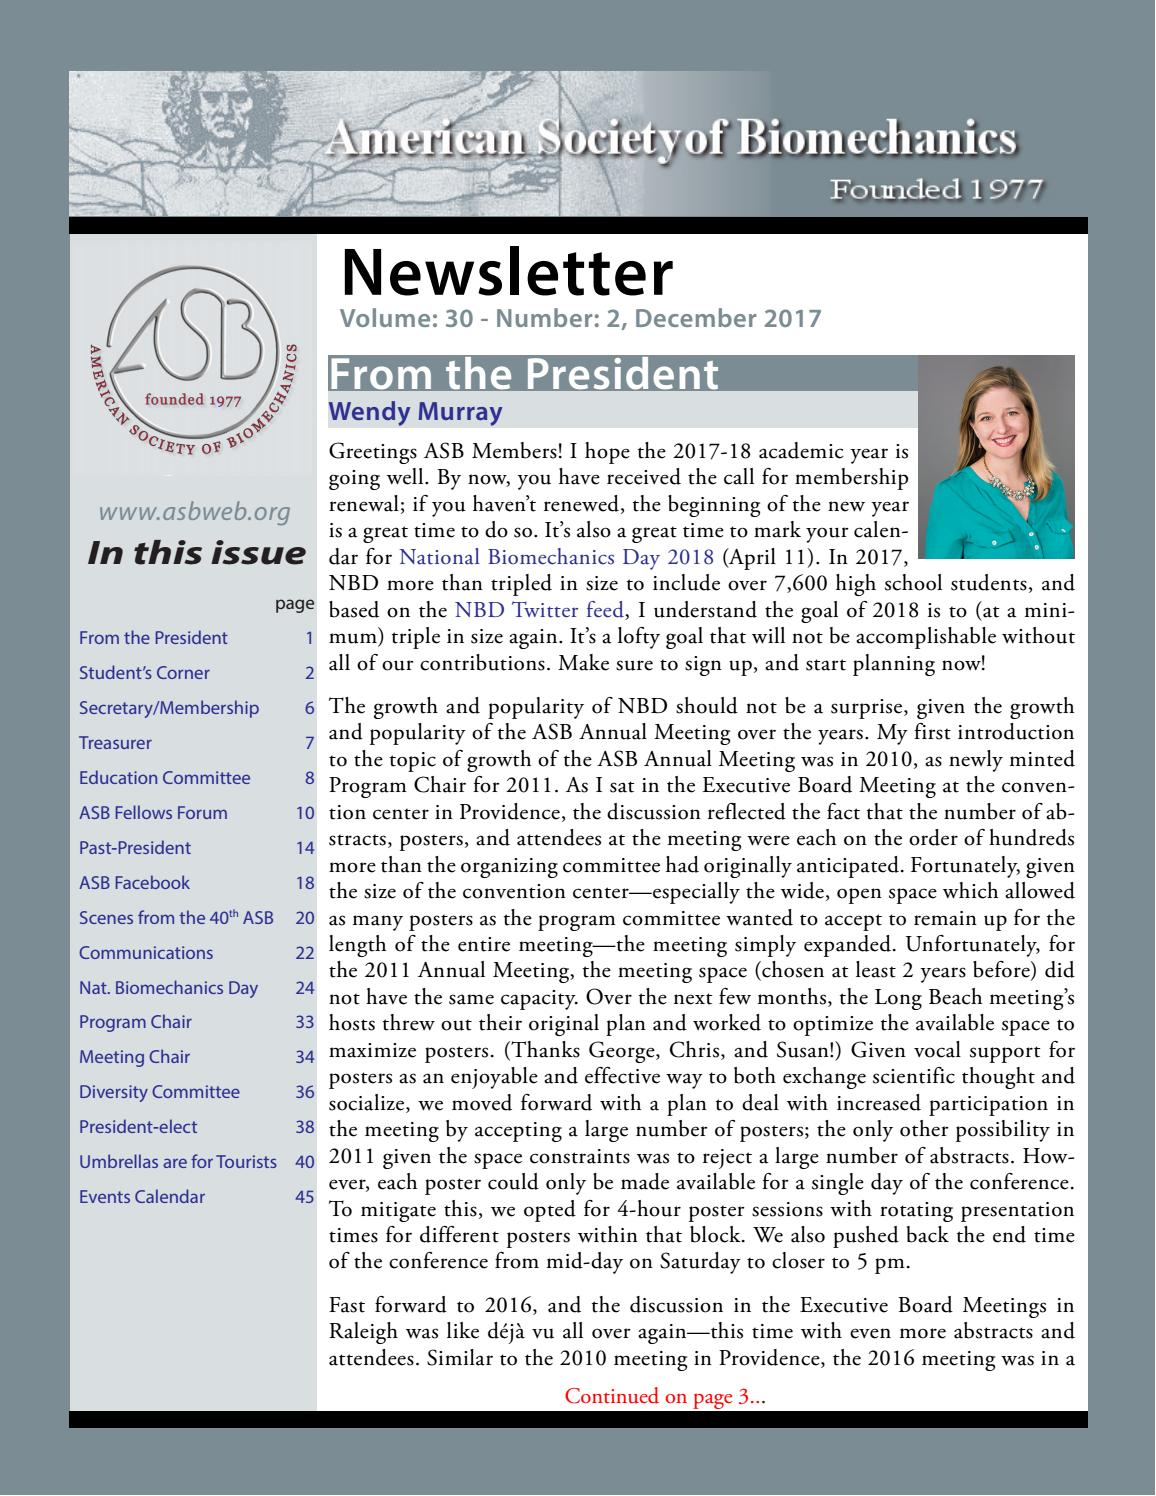 American Society of Biomechanics Newsletter by ASB web - issuu